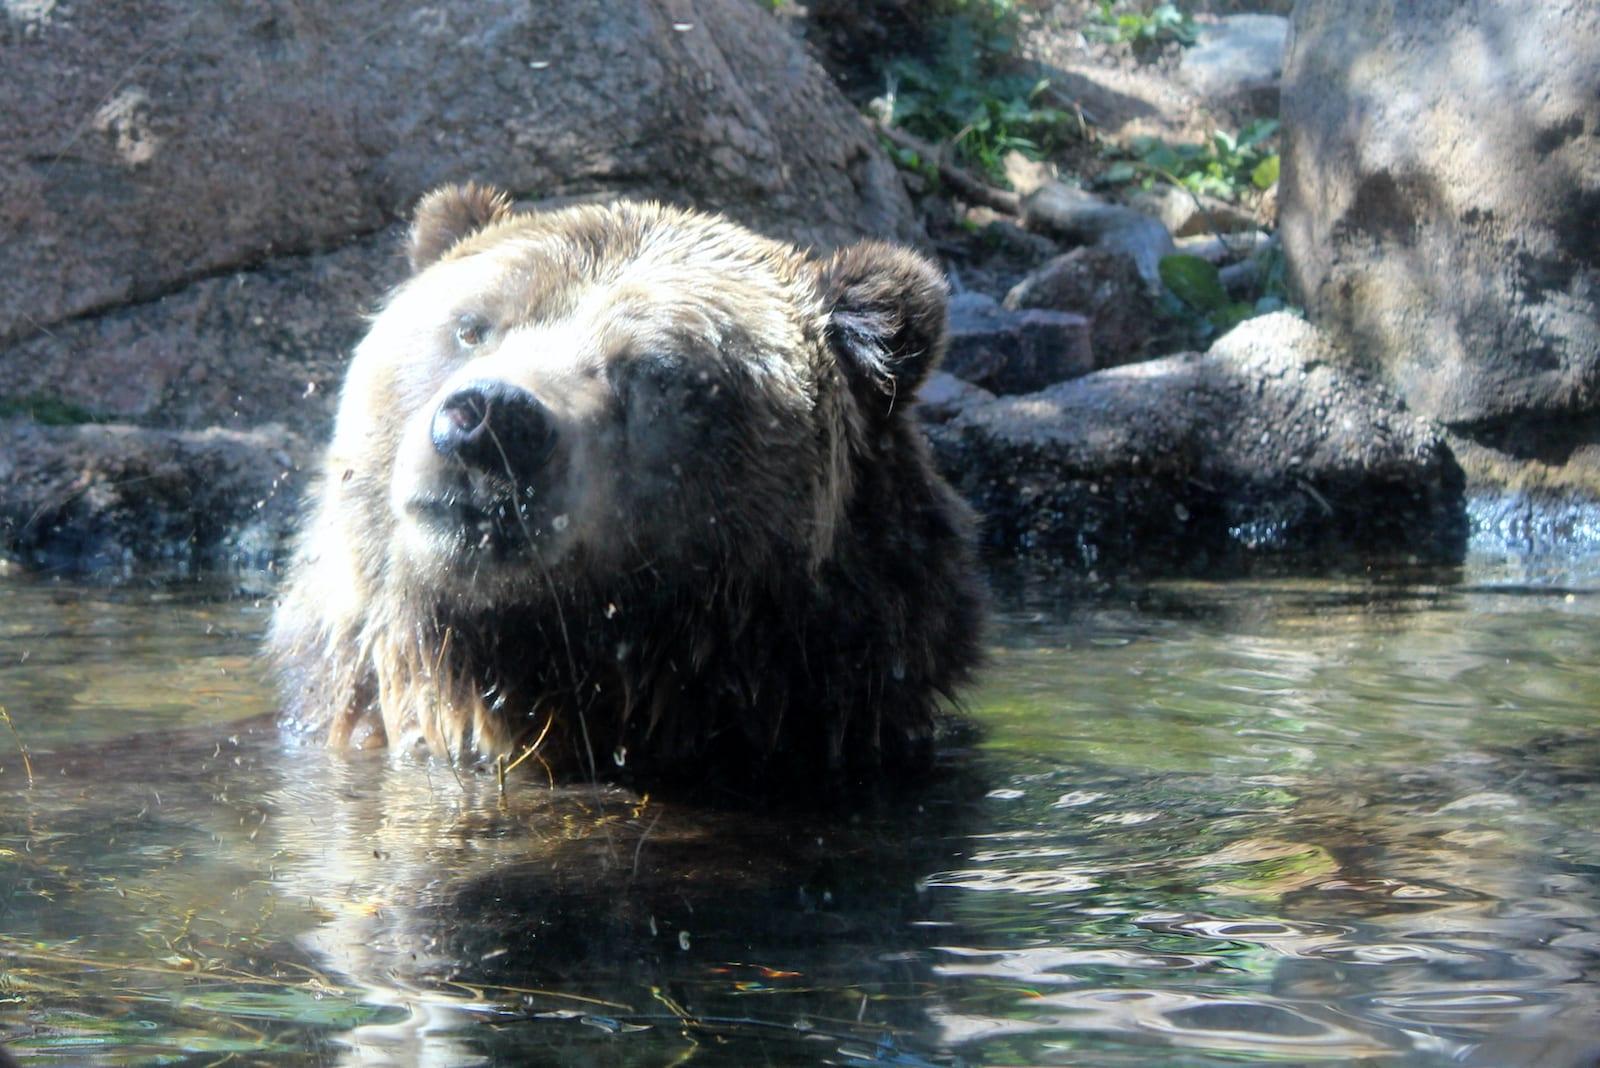 Grizzly Bear Cheyenne Mountain Zoo Colorado Springs